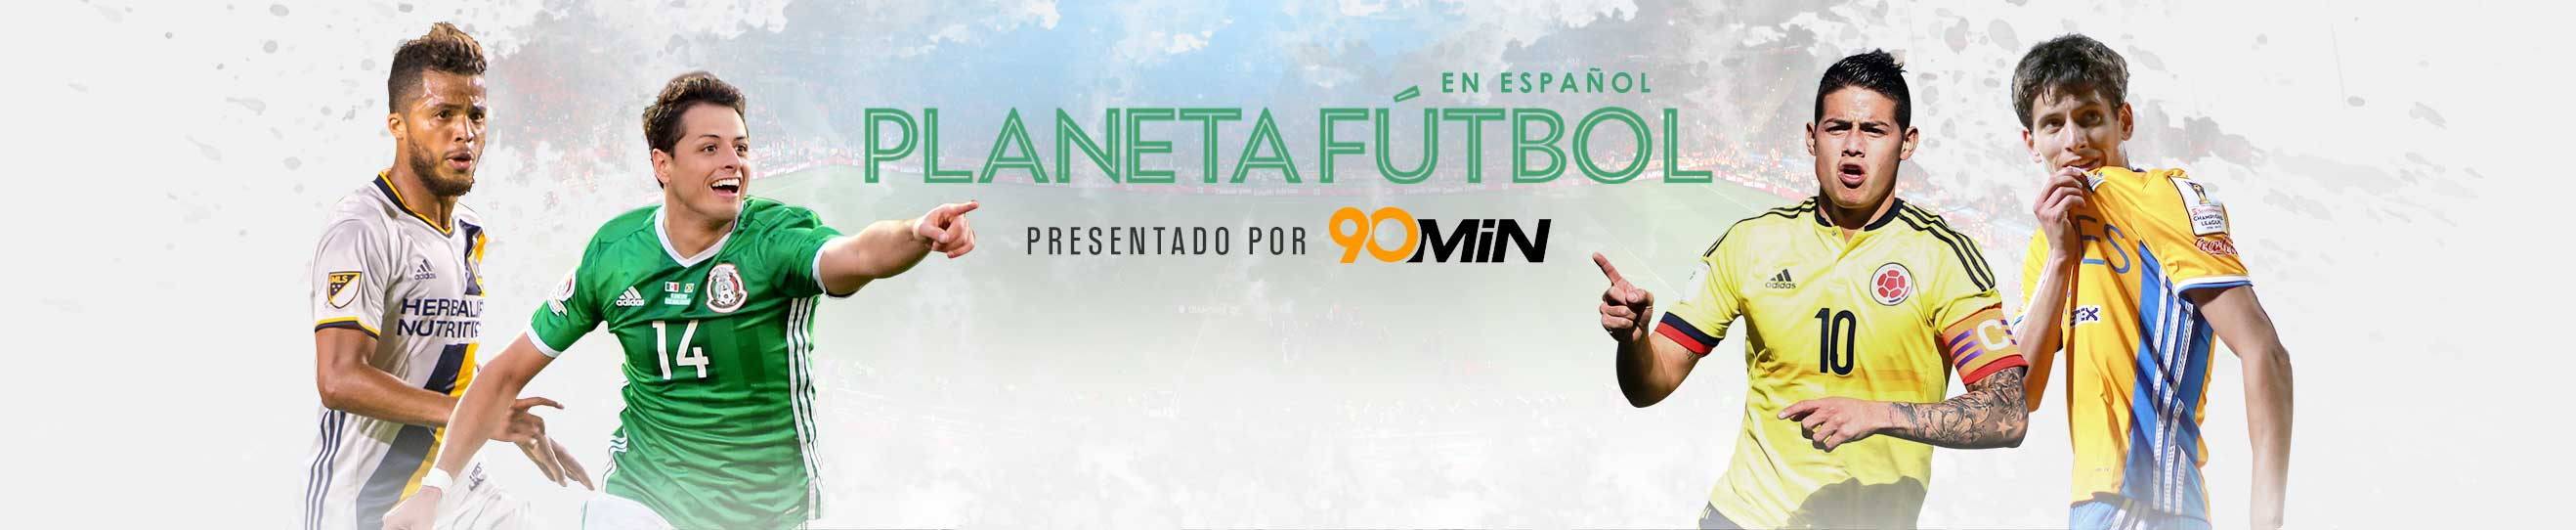 Planeta Futbol